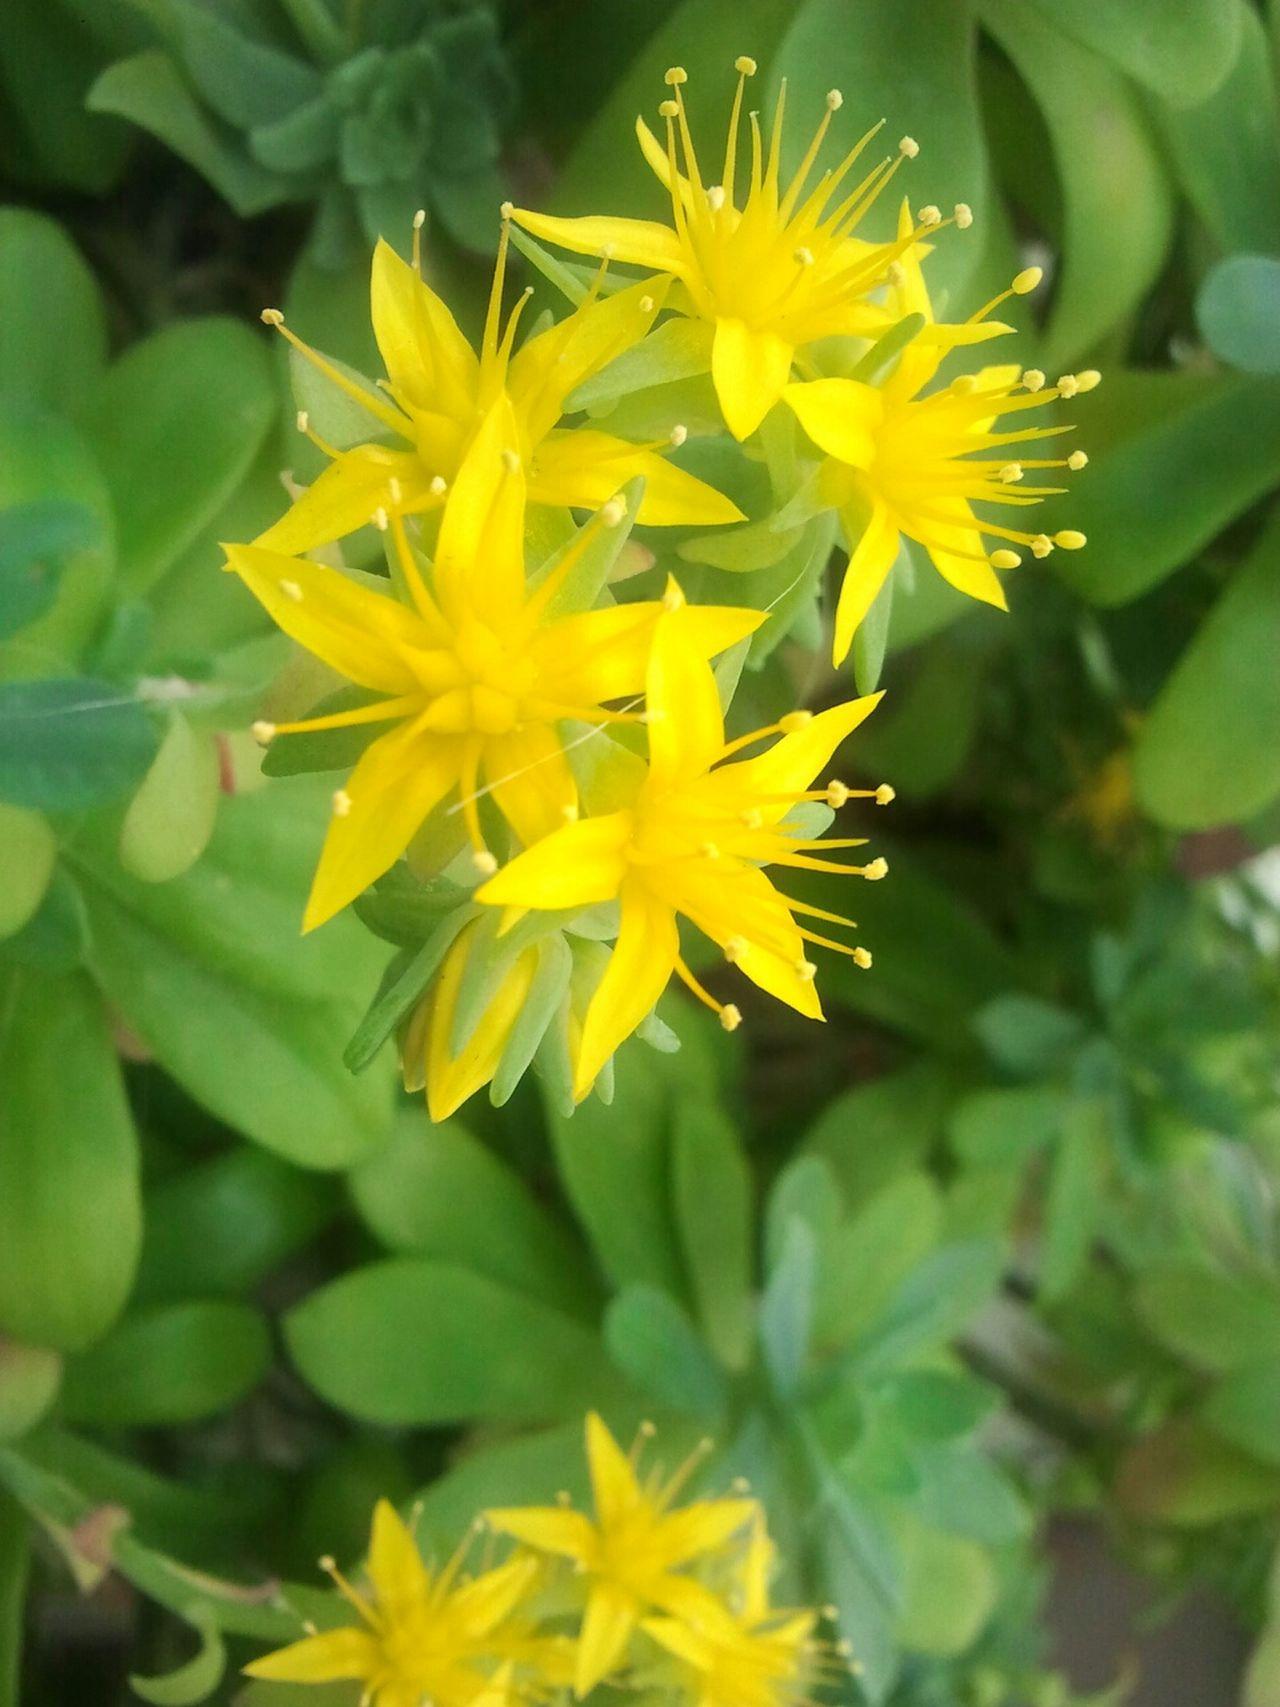 Flowers Yellow Yellow Flower Macro_flower Succulent Plant Balcony Garden Flowers,Plants & Garden Learn & Shoot: Simplicity